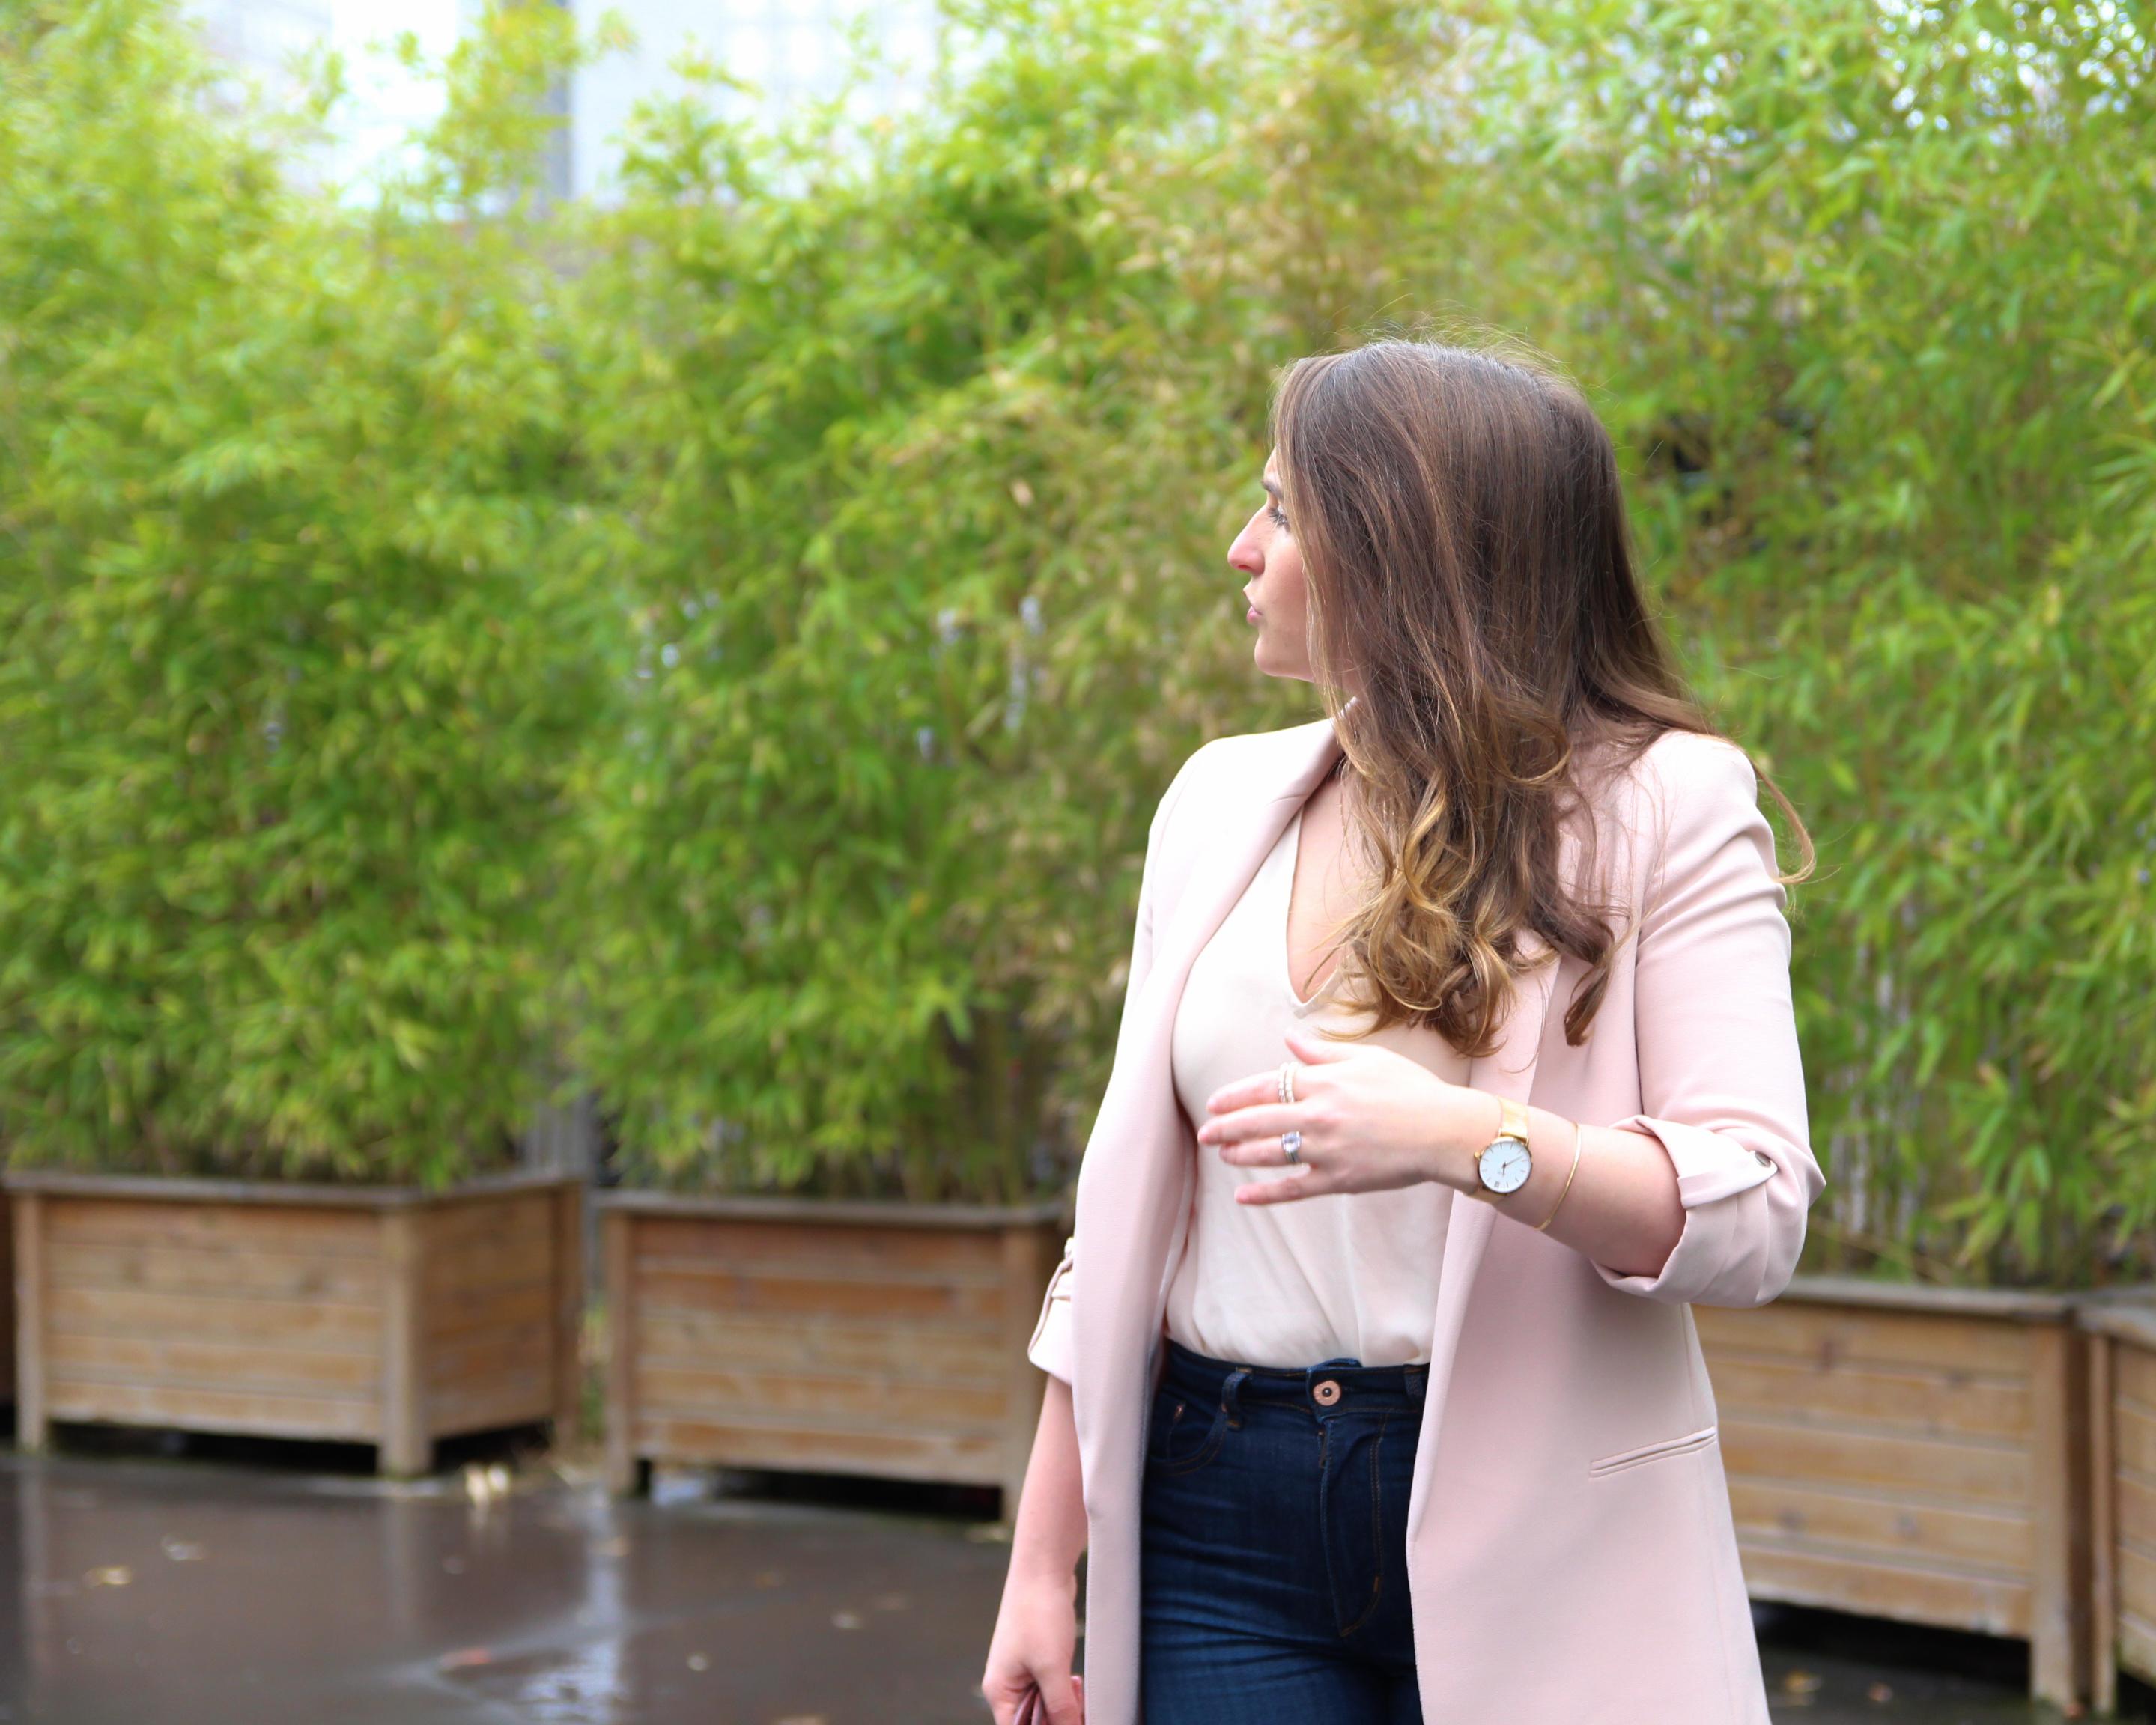 fashionblogger-influencer-jacket-zara-rosepastel-paris-seralynepointcom-114348